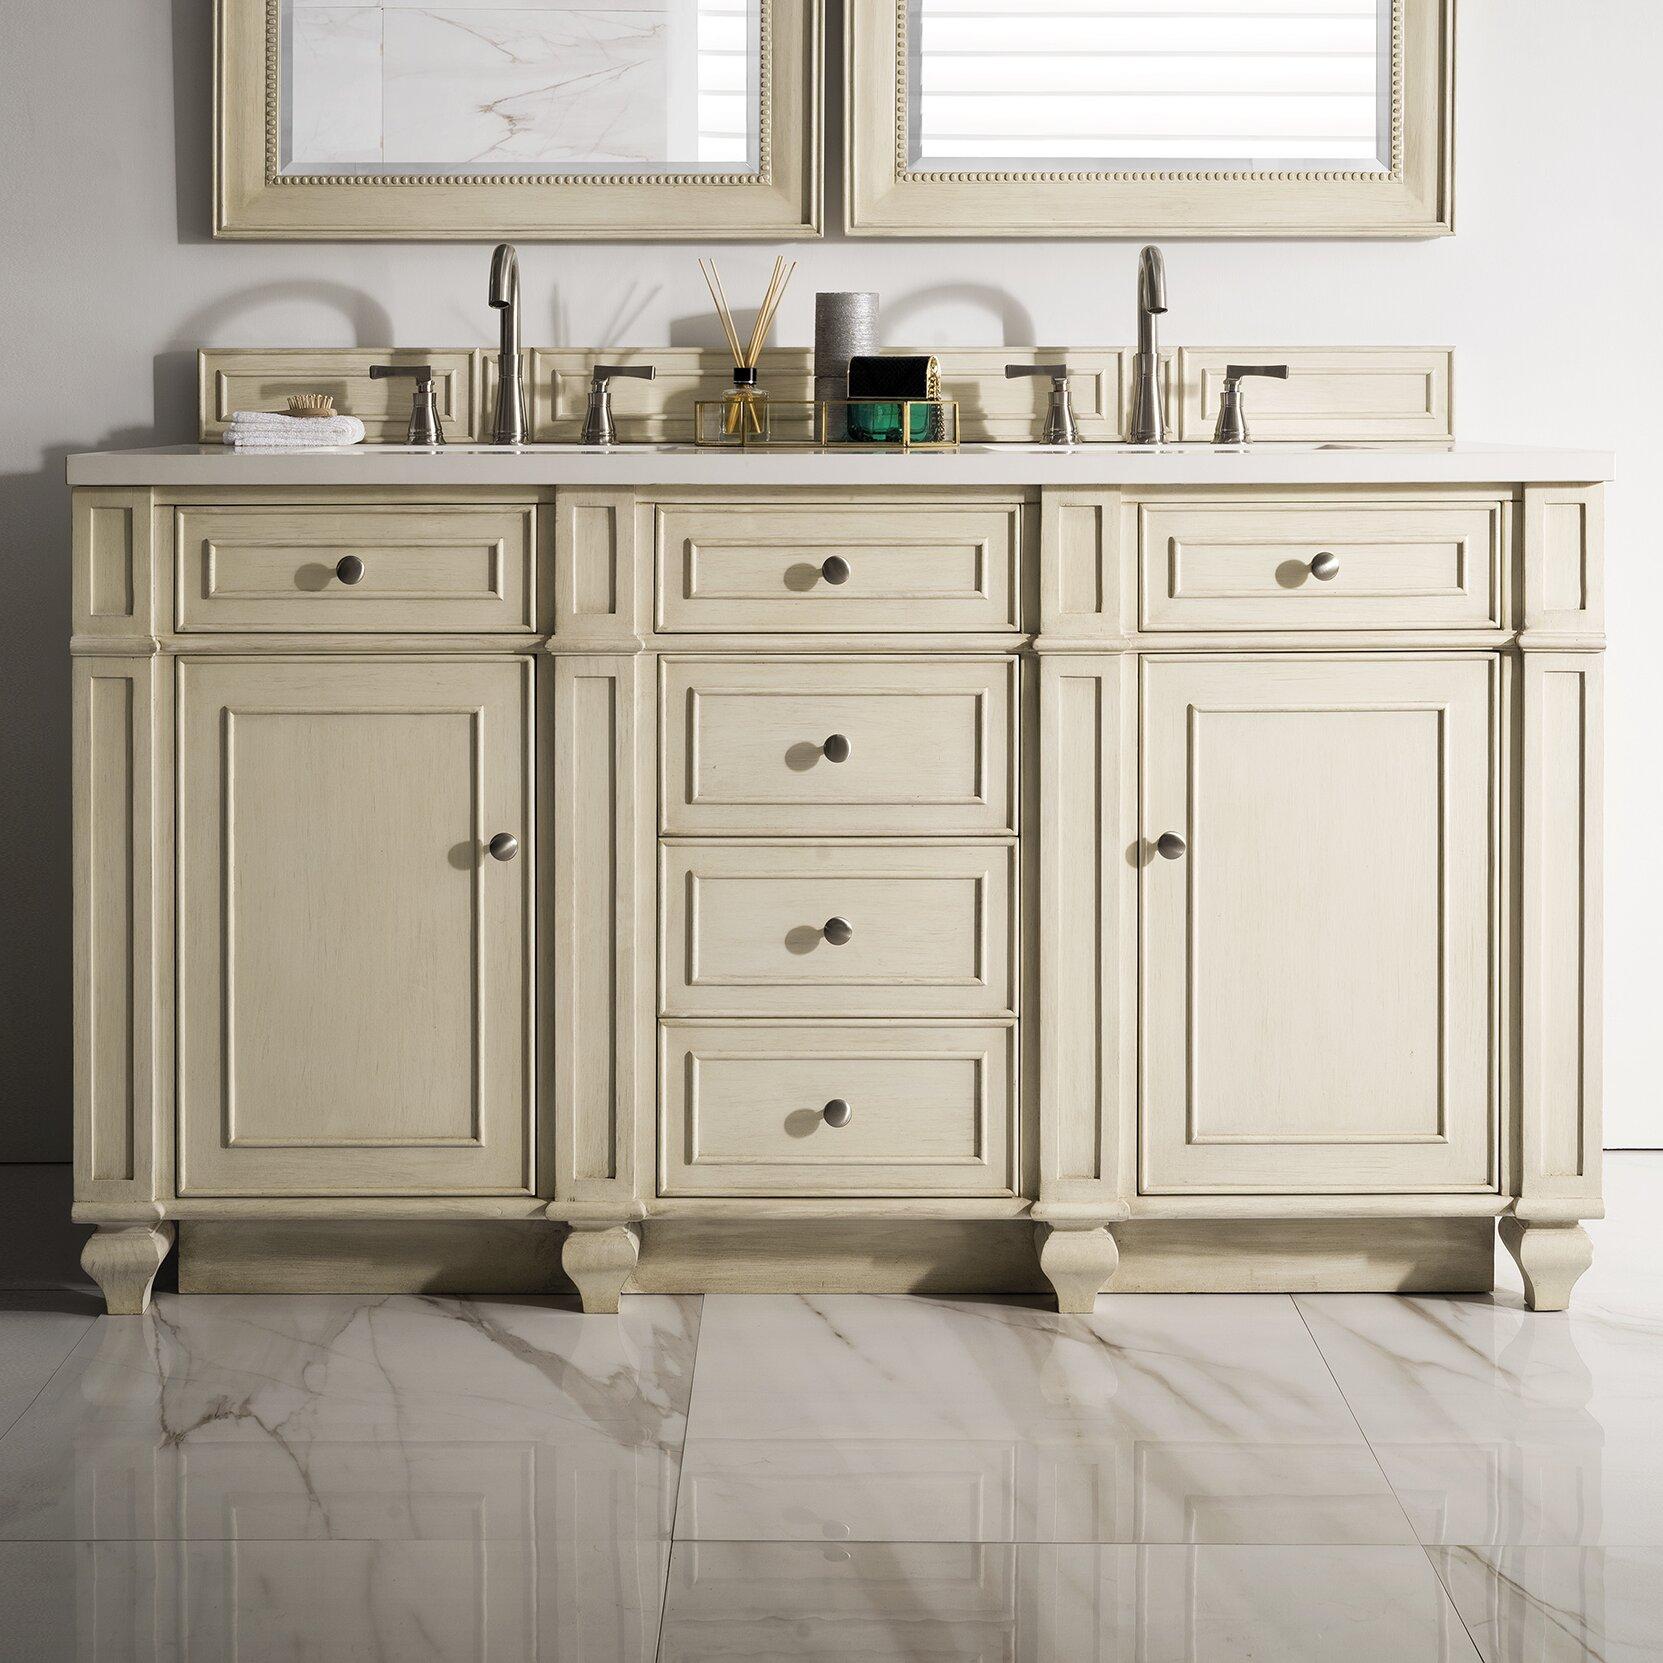 "Vintage Bathroom Vanity Set: Alcott Hill Lambrecht 60"" Double Vintage Vanilla Bathroom"